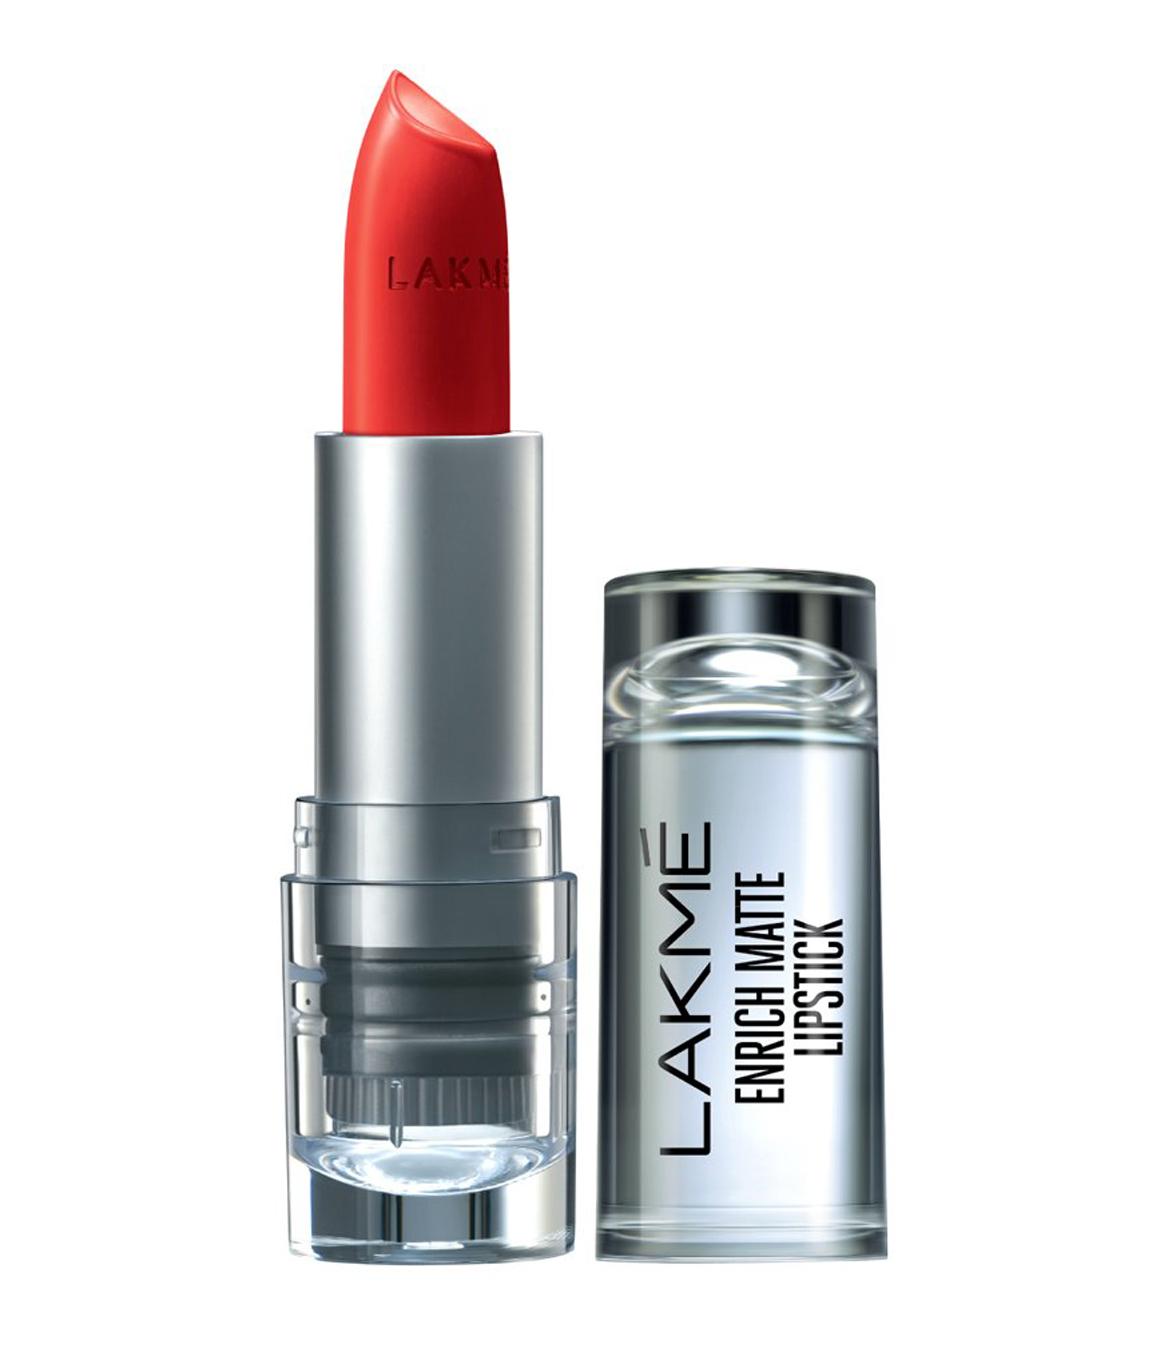 Lakme Enrich Matte Lipstick, Shade RM14, 4.7gm